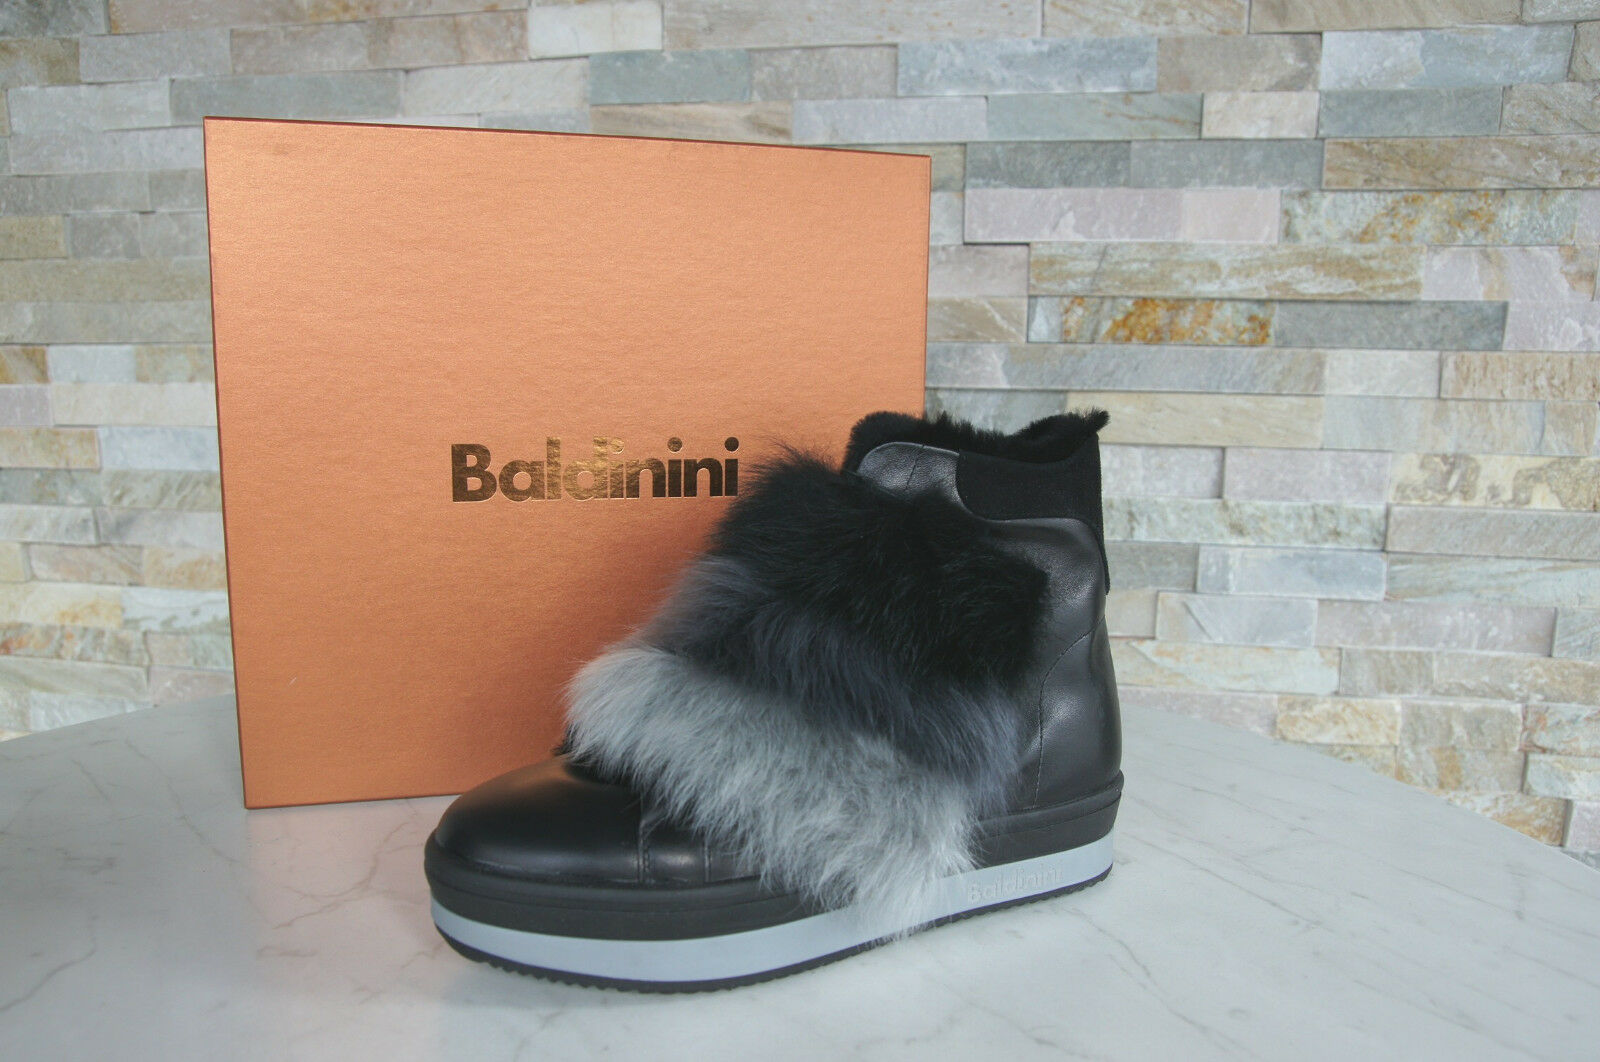 Baldinini Gr booties 37 Stiefeletten Fell booties Gr Schuhe schwarz NEU de2663